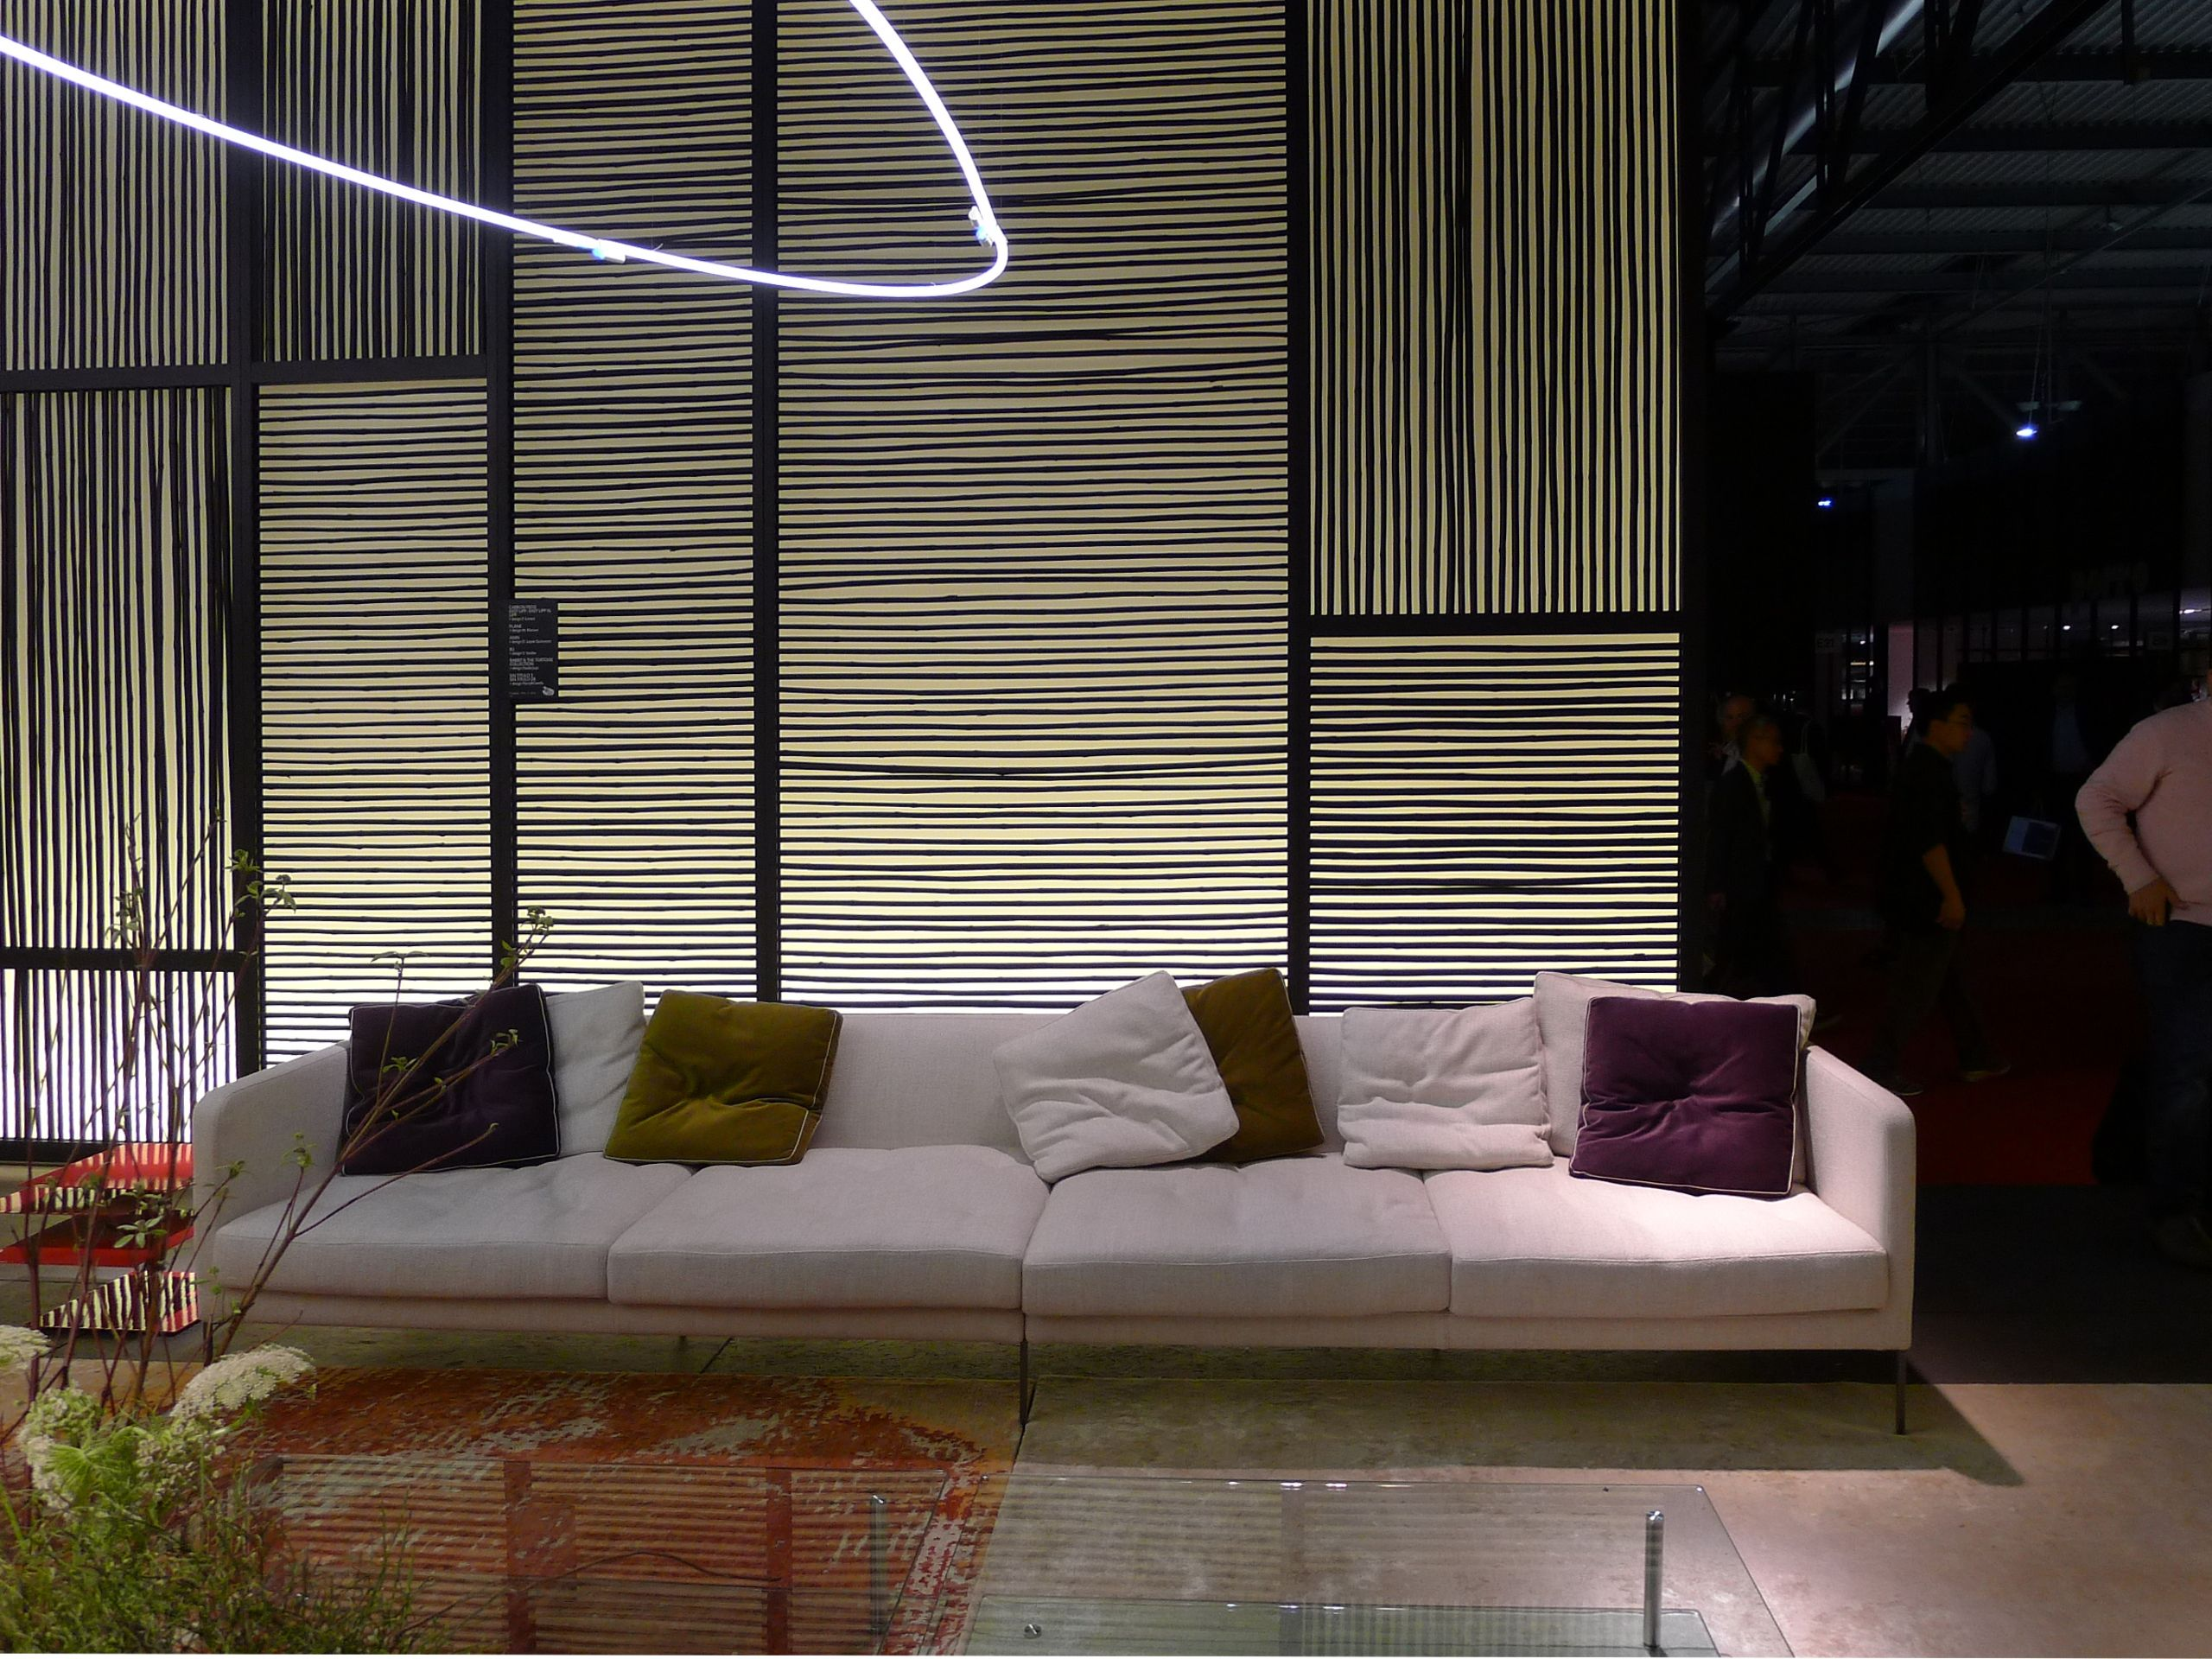 2015 salonemobili milano #livingdivani #easy lipp #lissoni #wohnidee ...